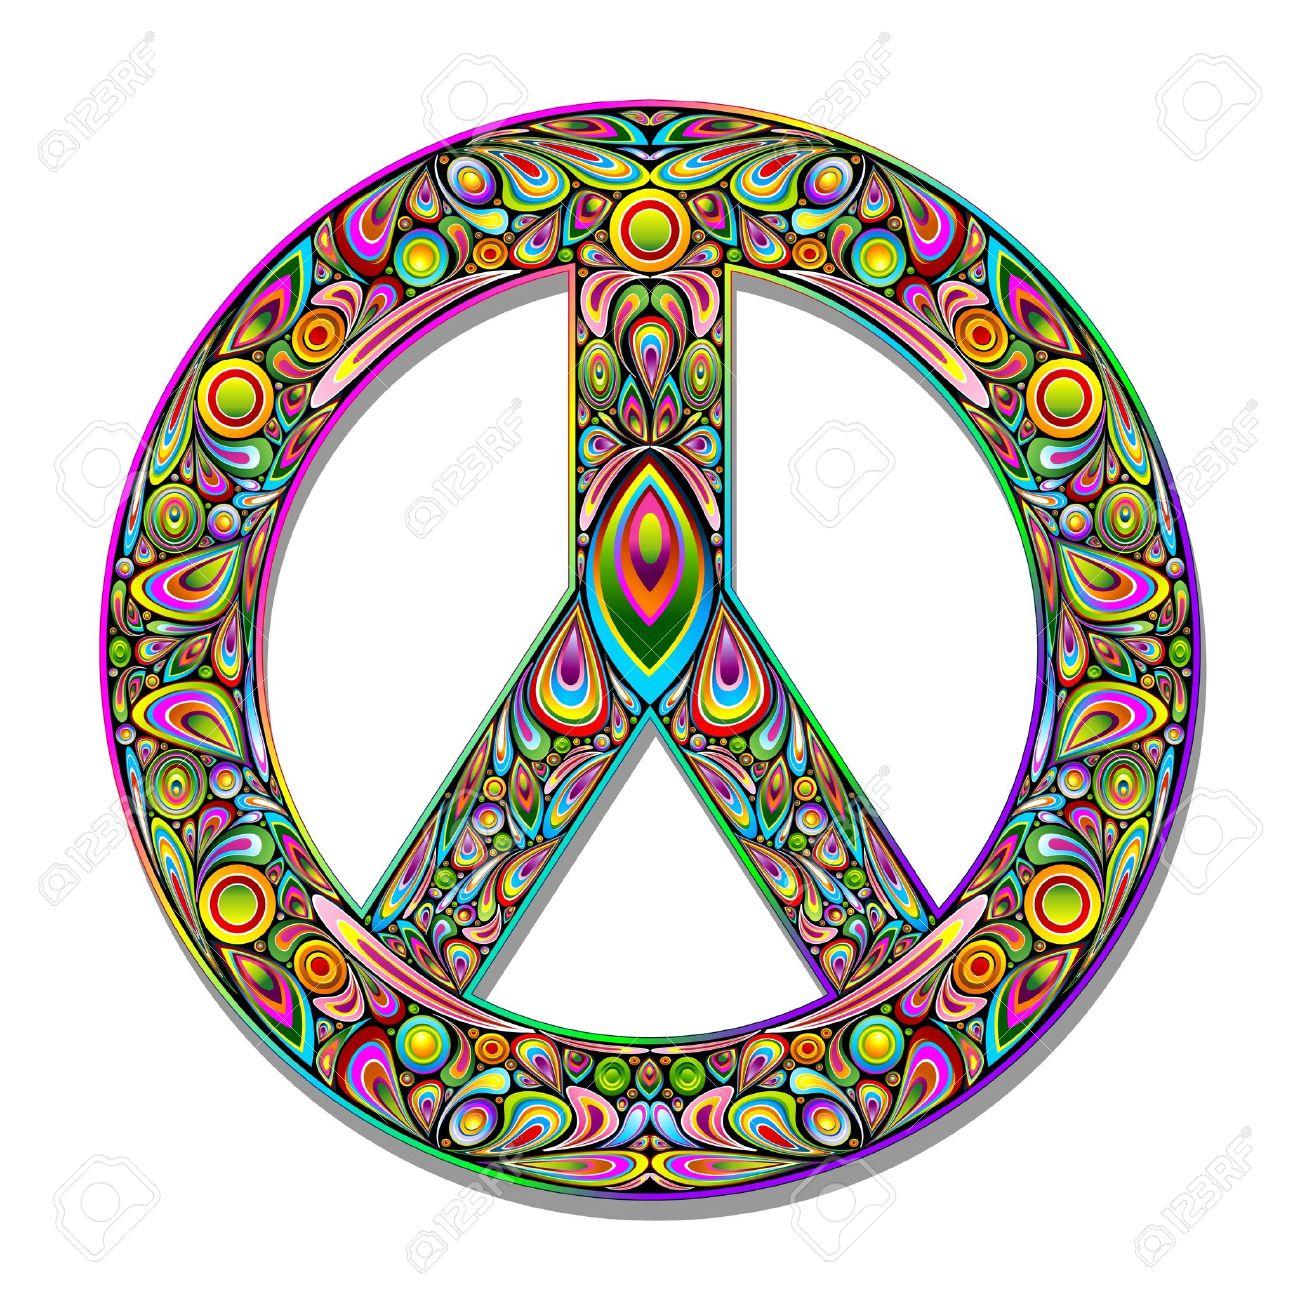 Peace Symbol Psychedelic Art Design Royalty Free Cliparts Vectors